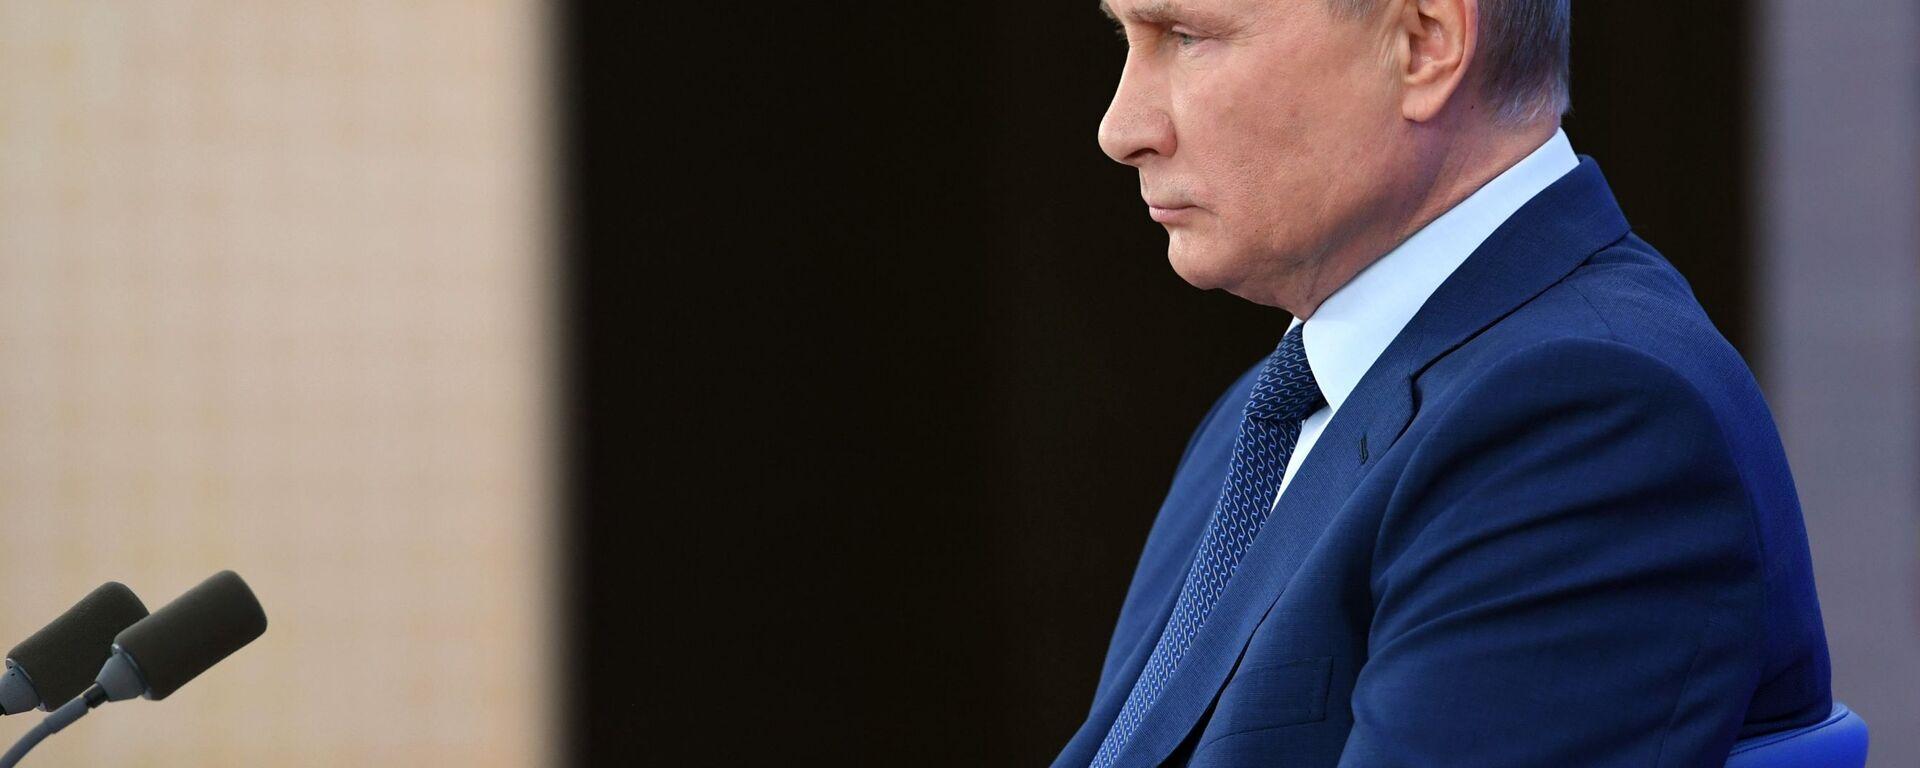 Prezident RF Vladimir Putin - Sputnik Oʻzbekiston, 1920, 01.07.2021